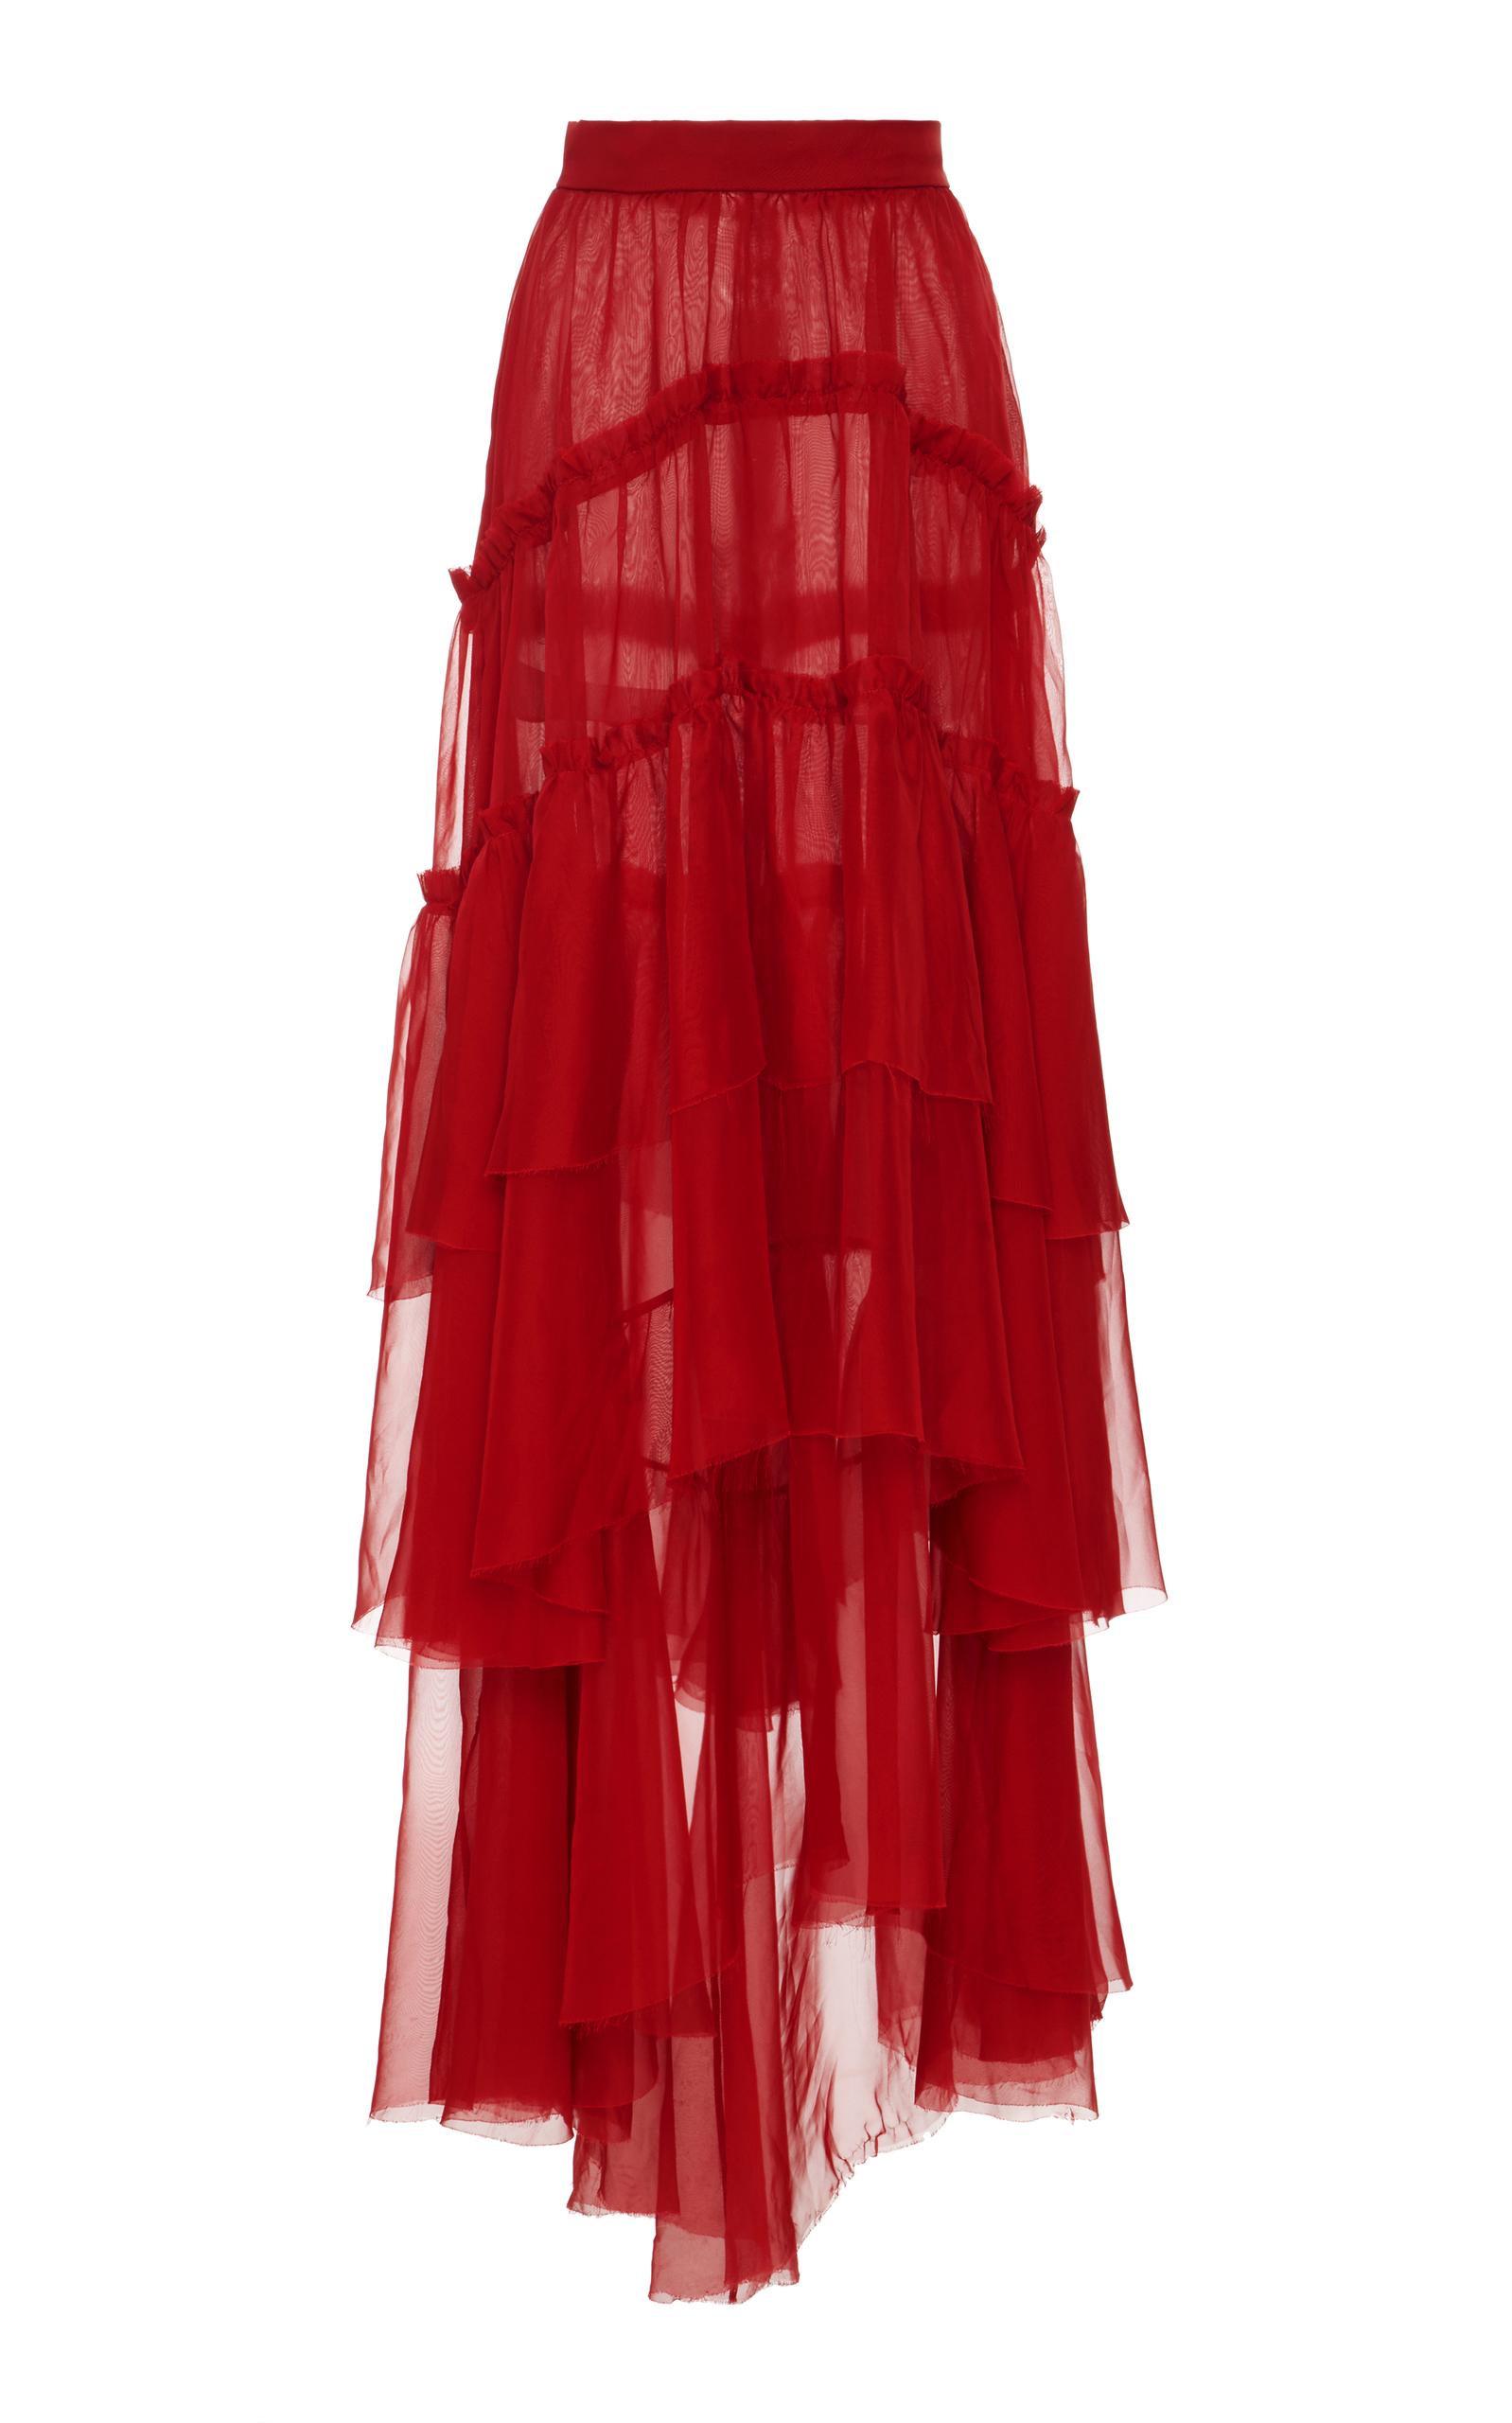 Sale New Arrival Buy Cheap Inexpensive Patbo fiesta ruffle maxi skirt PmHb0kplKu